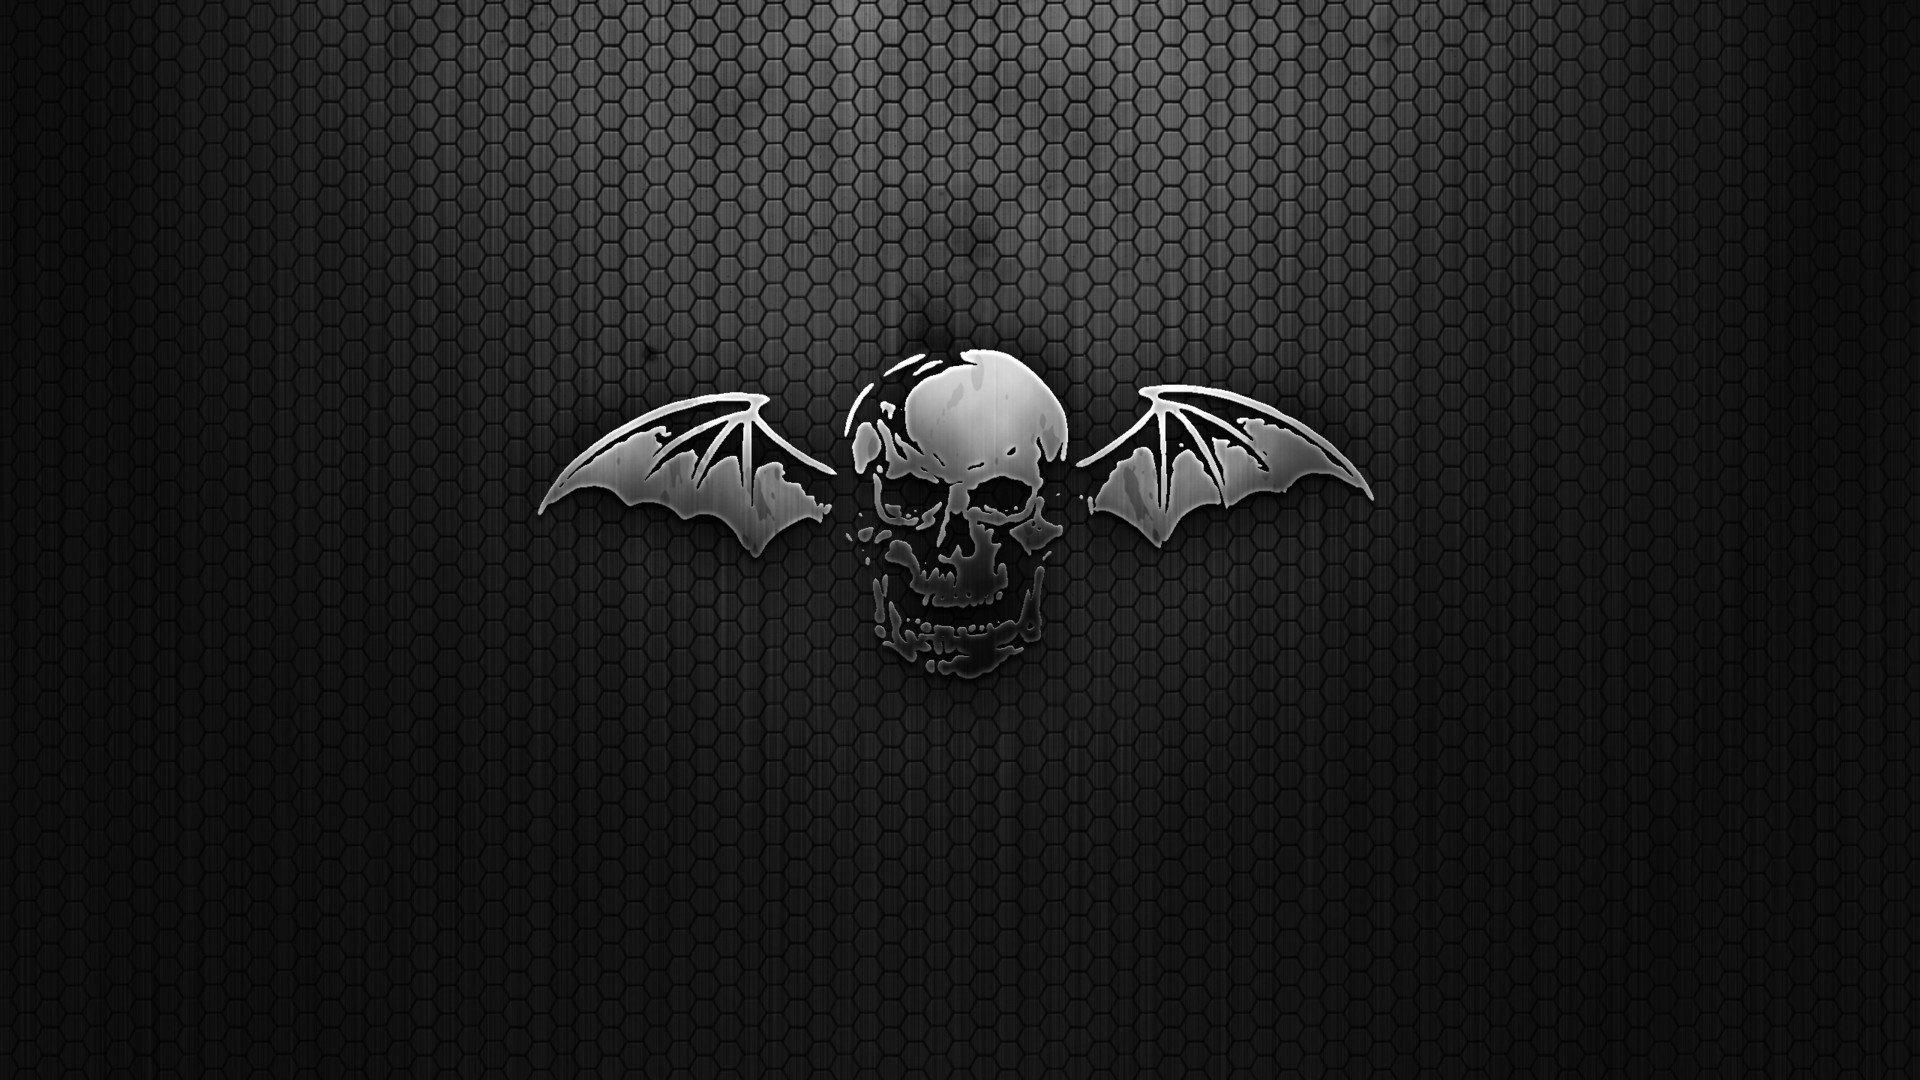 Free download Skull wallpaper ID:320792 full hd 1920x1080 for computer